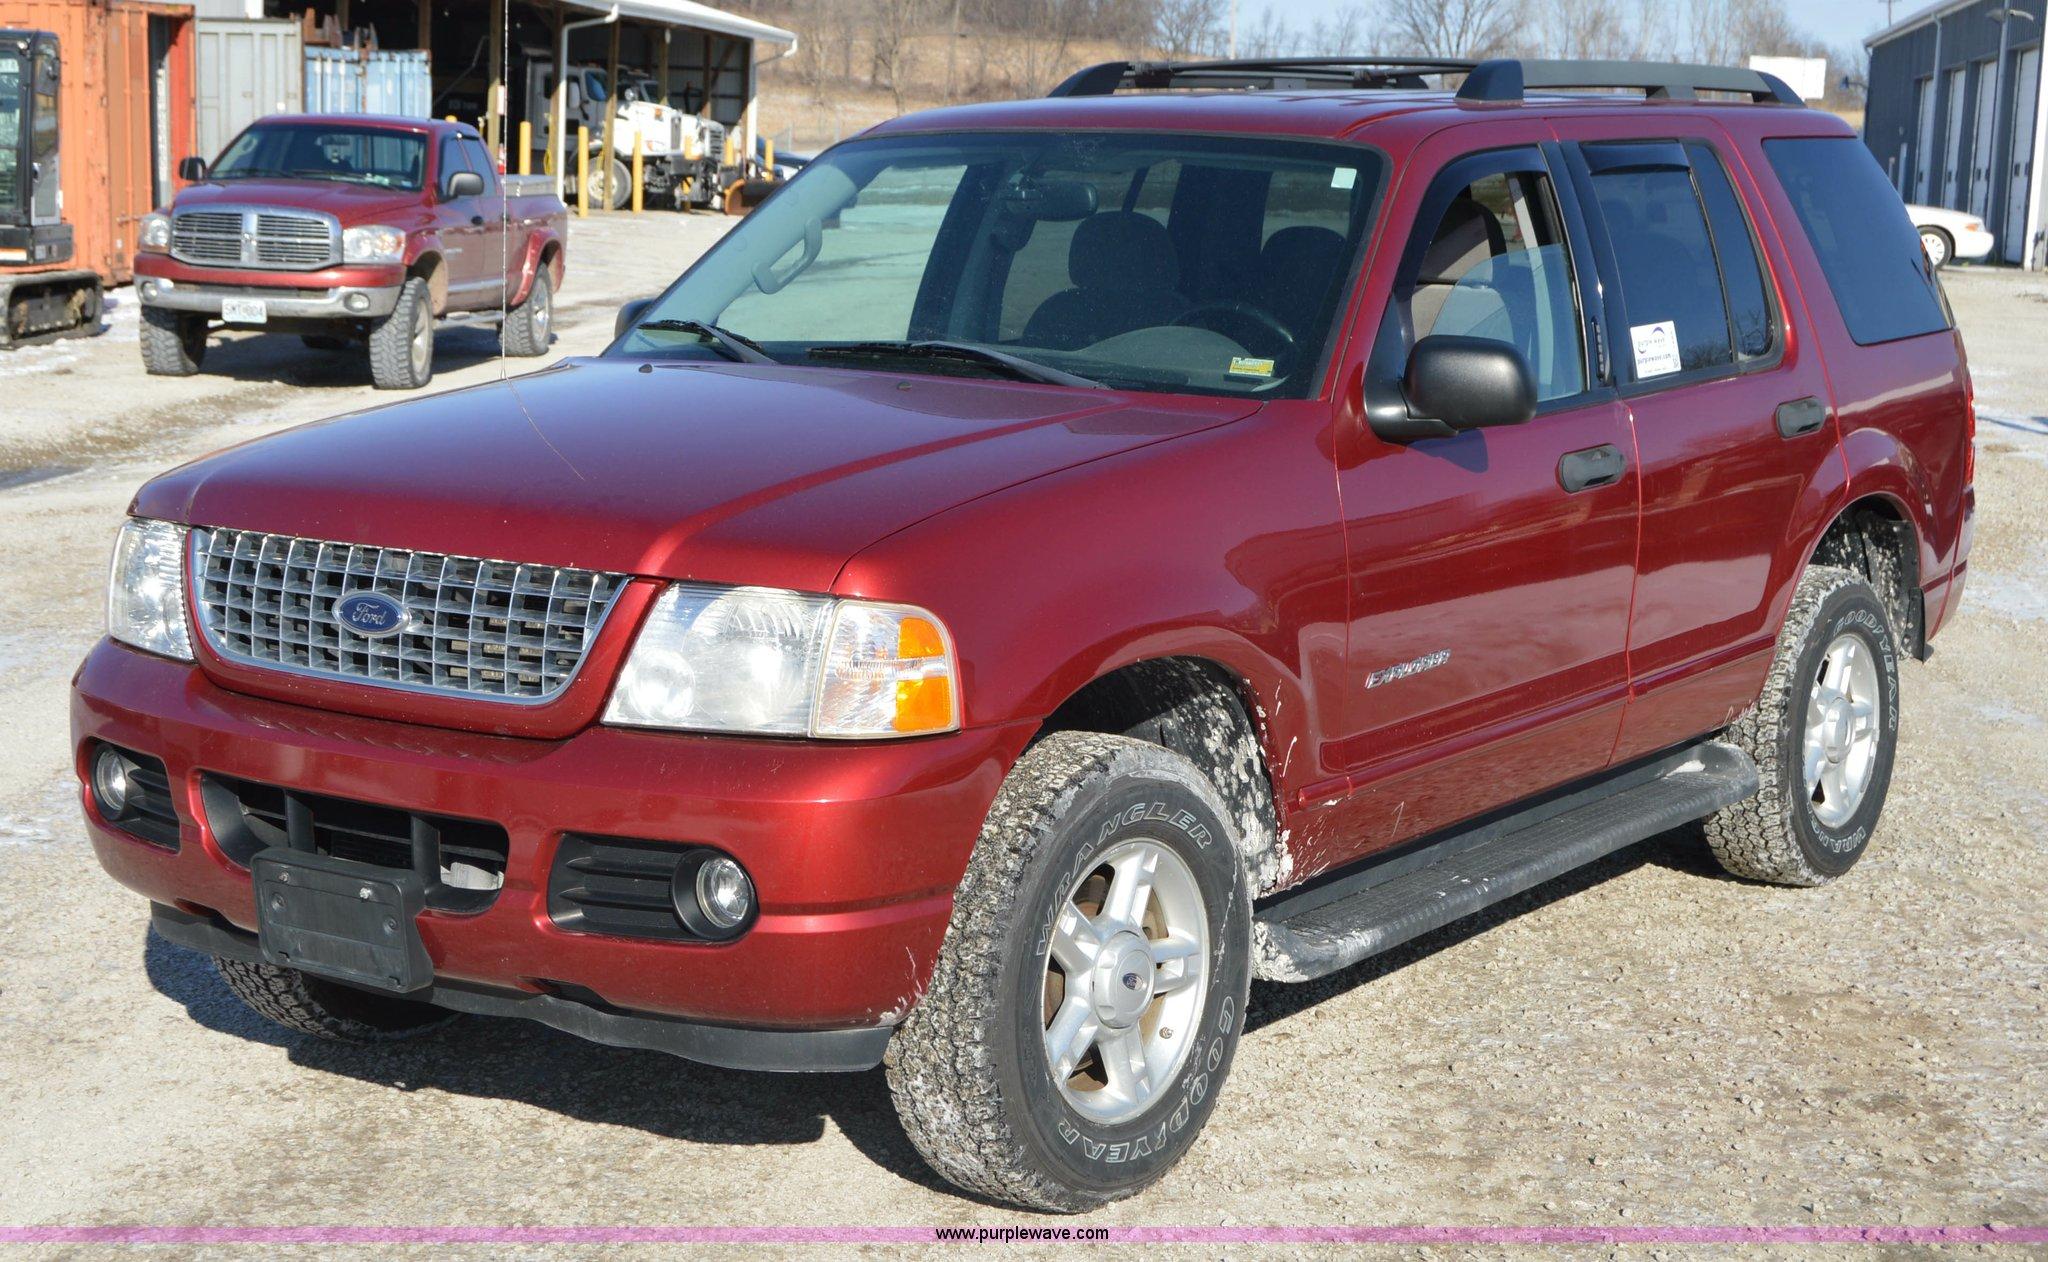 2005 Ford Explorer Advance Trac Rsc Suv Item I6887 Sold